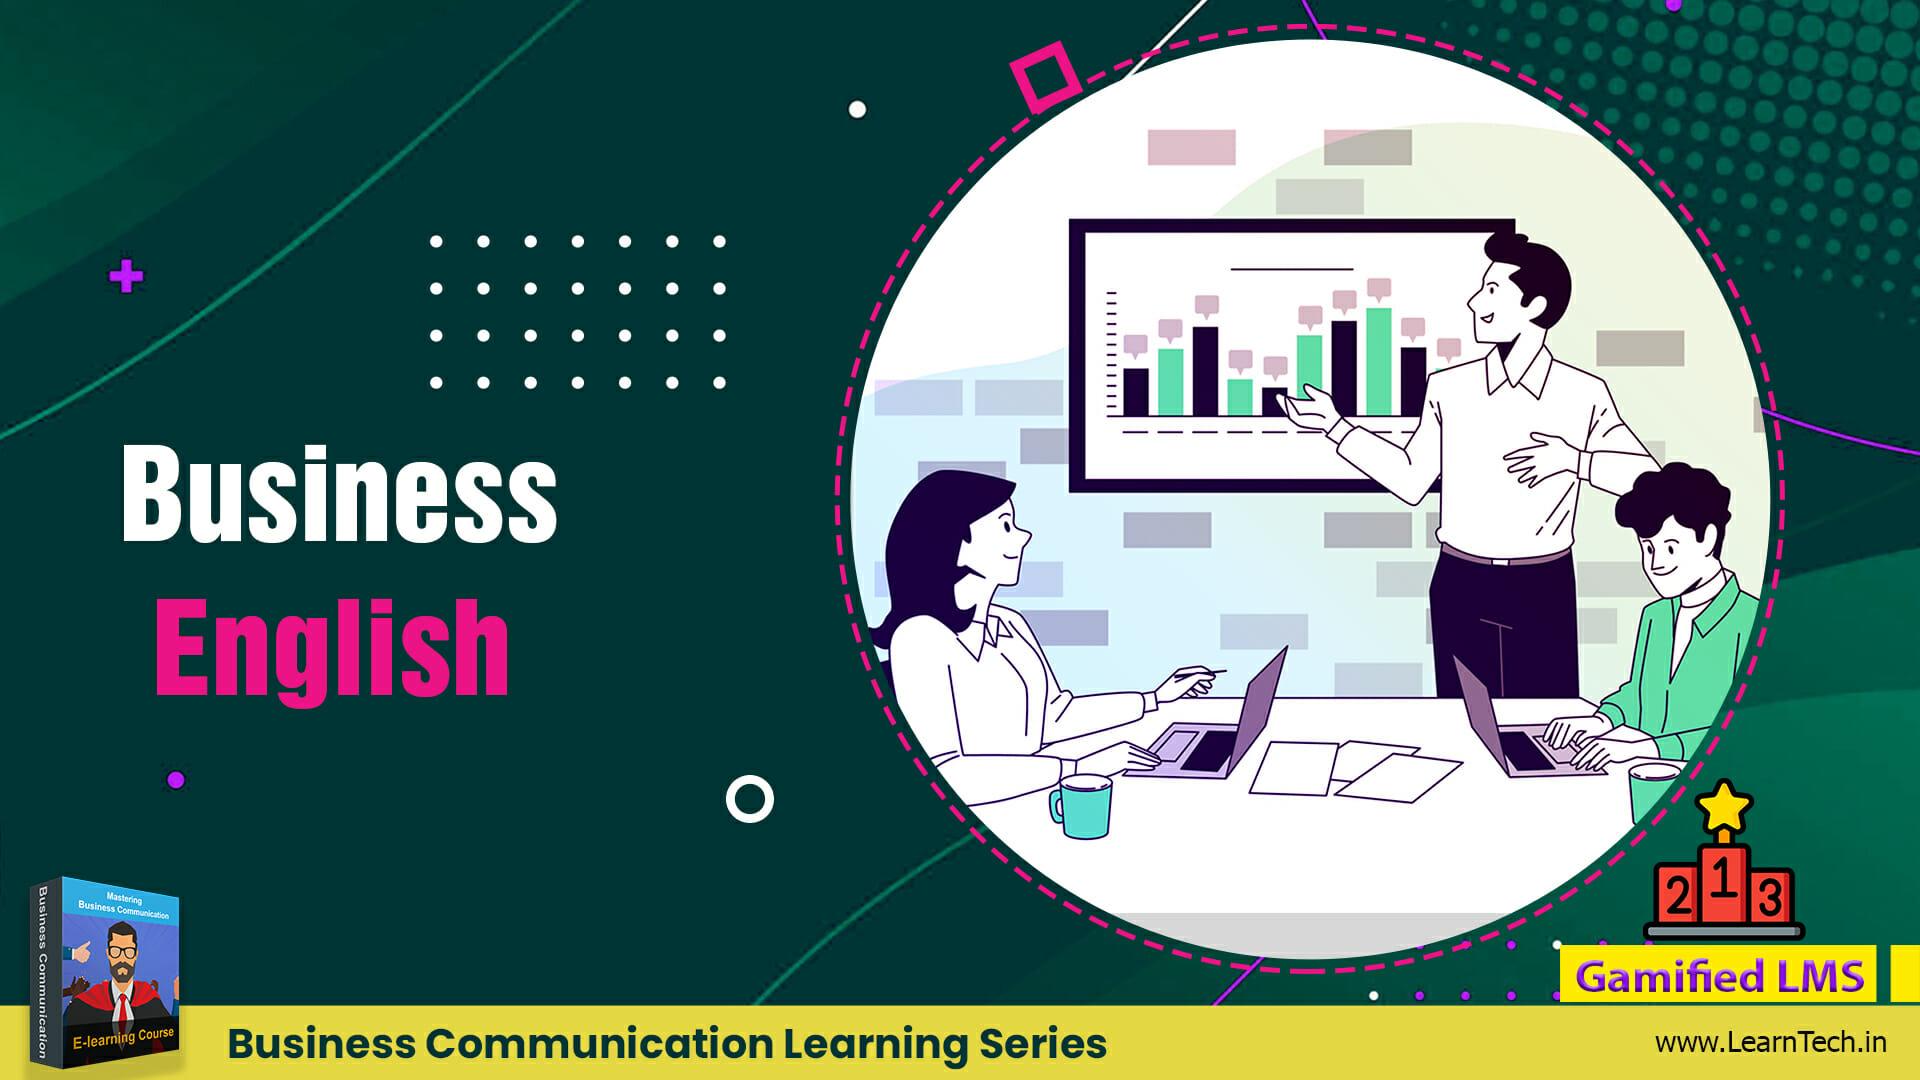 Business English – Off the shelf - Business Communication training - Off the Shelf E learning Courses